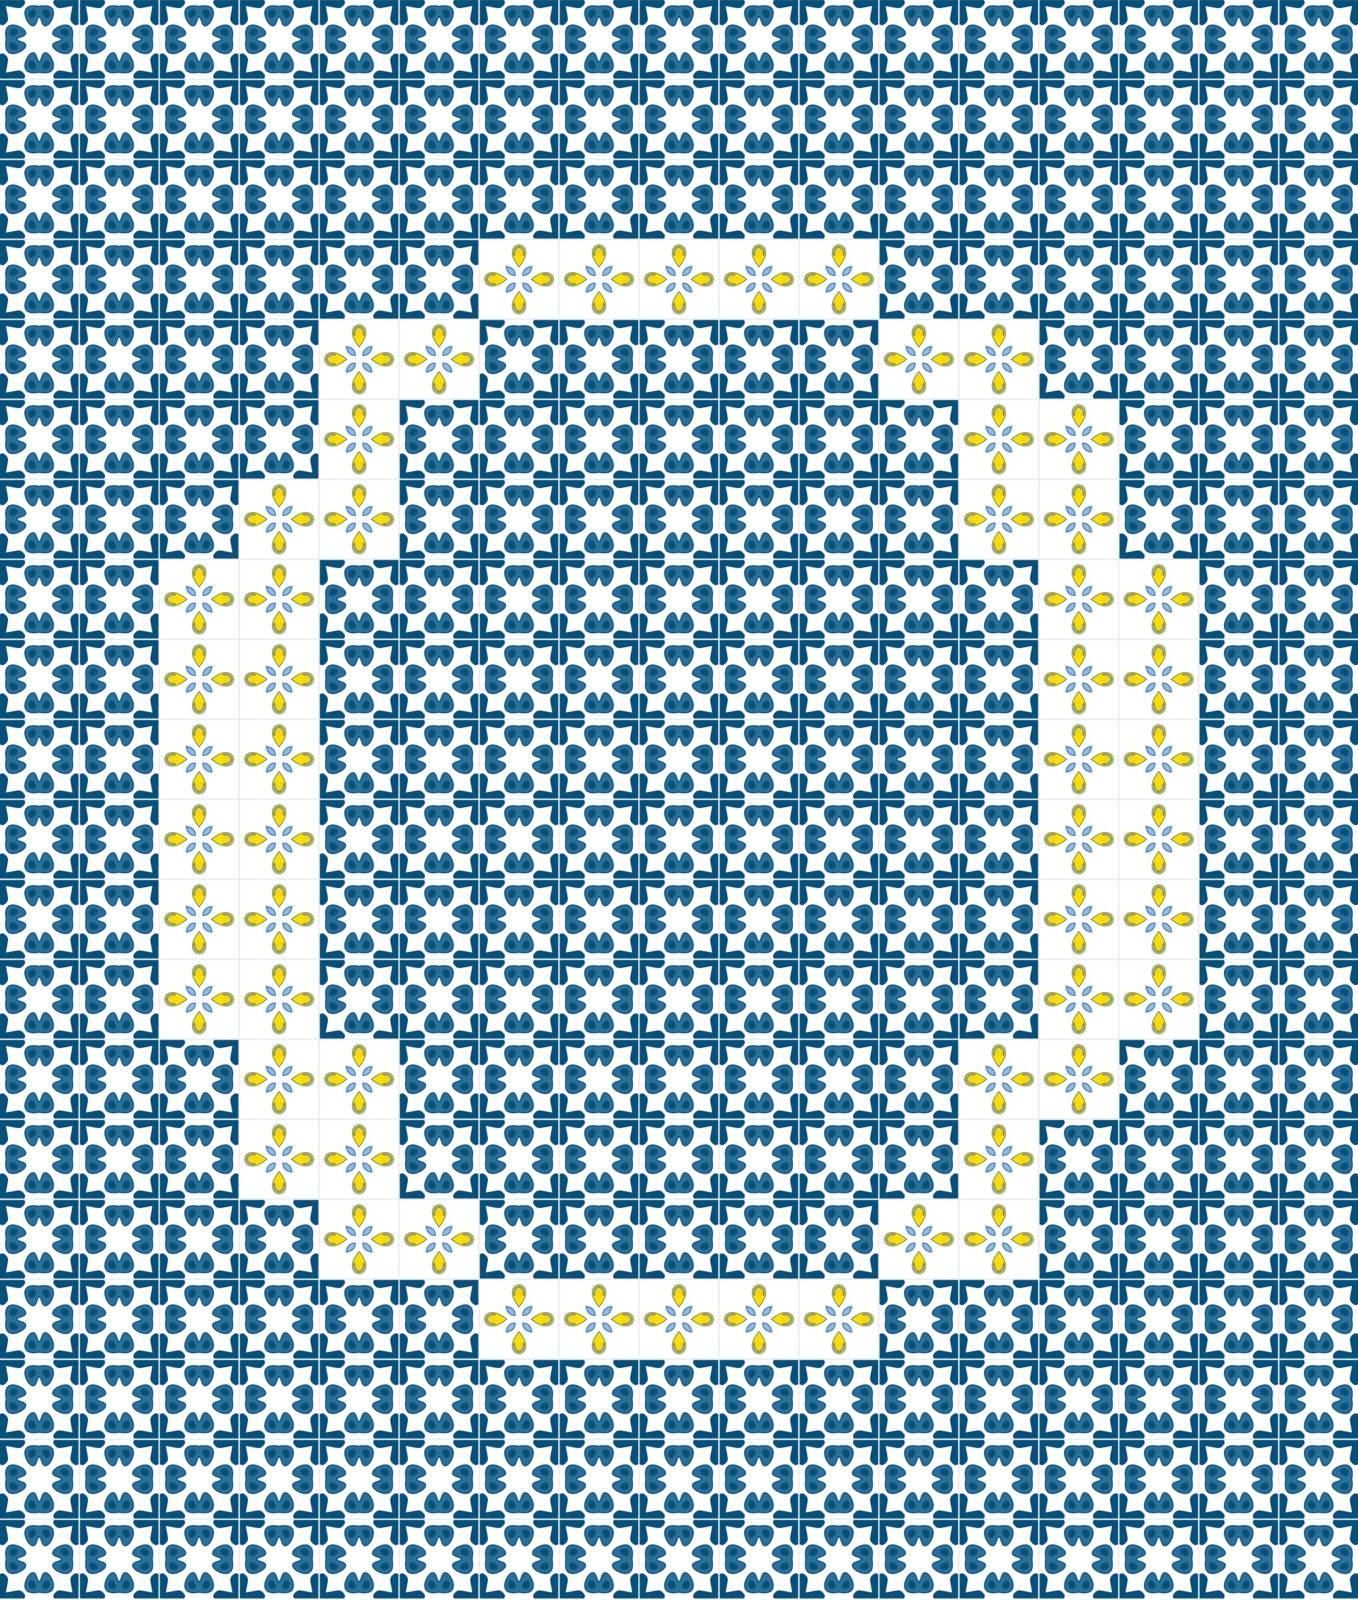 Capital letter O made of Portuguese tiles